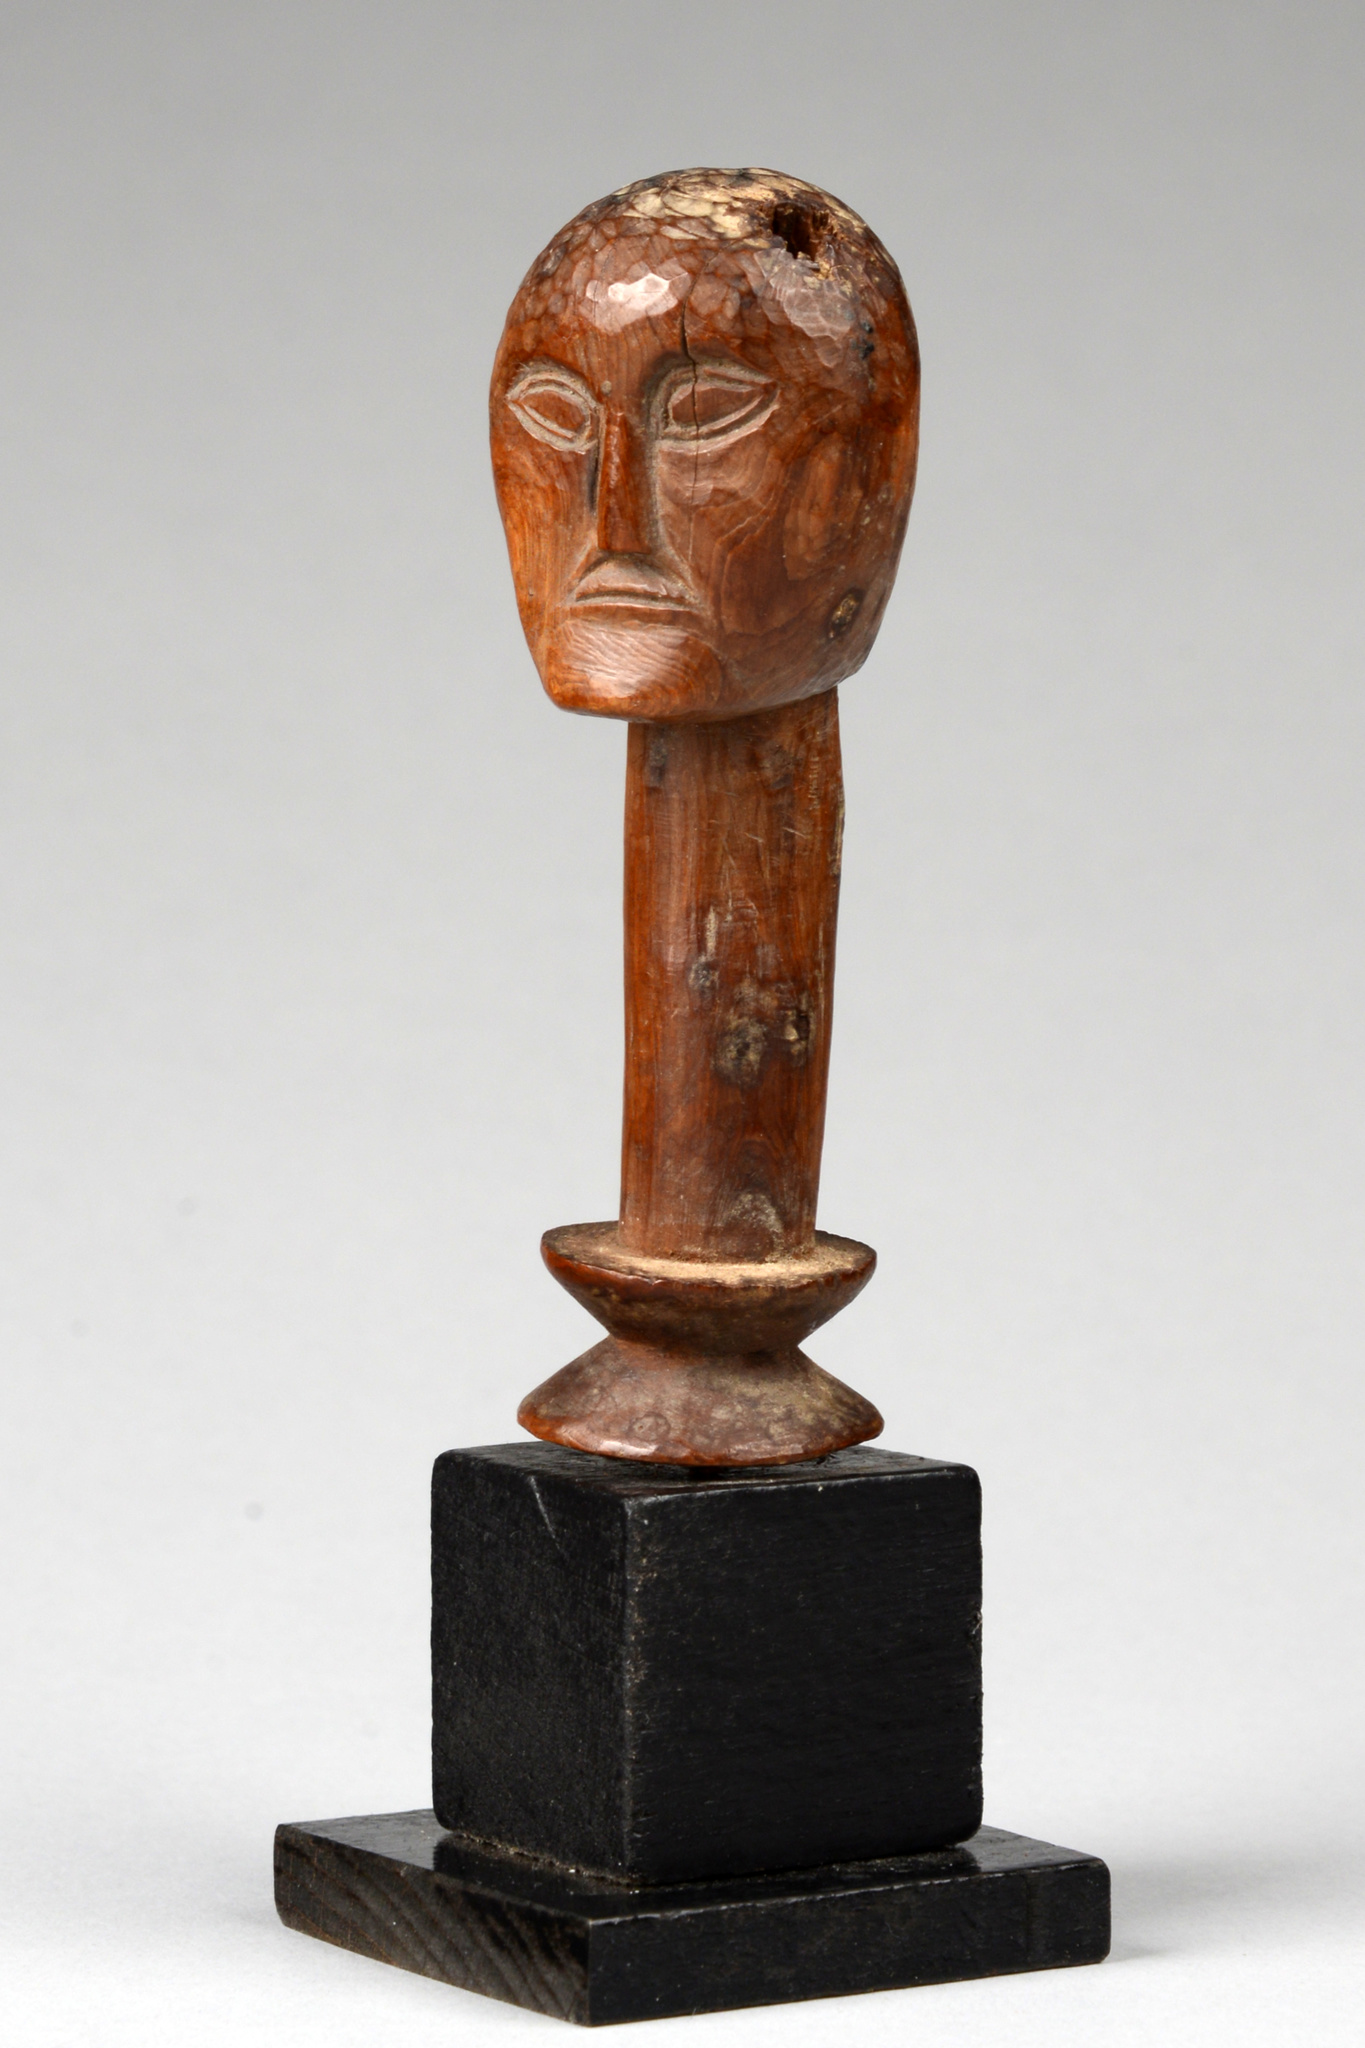 Anthropomorphic head sculpture